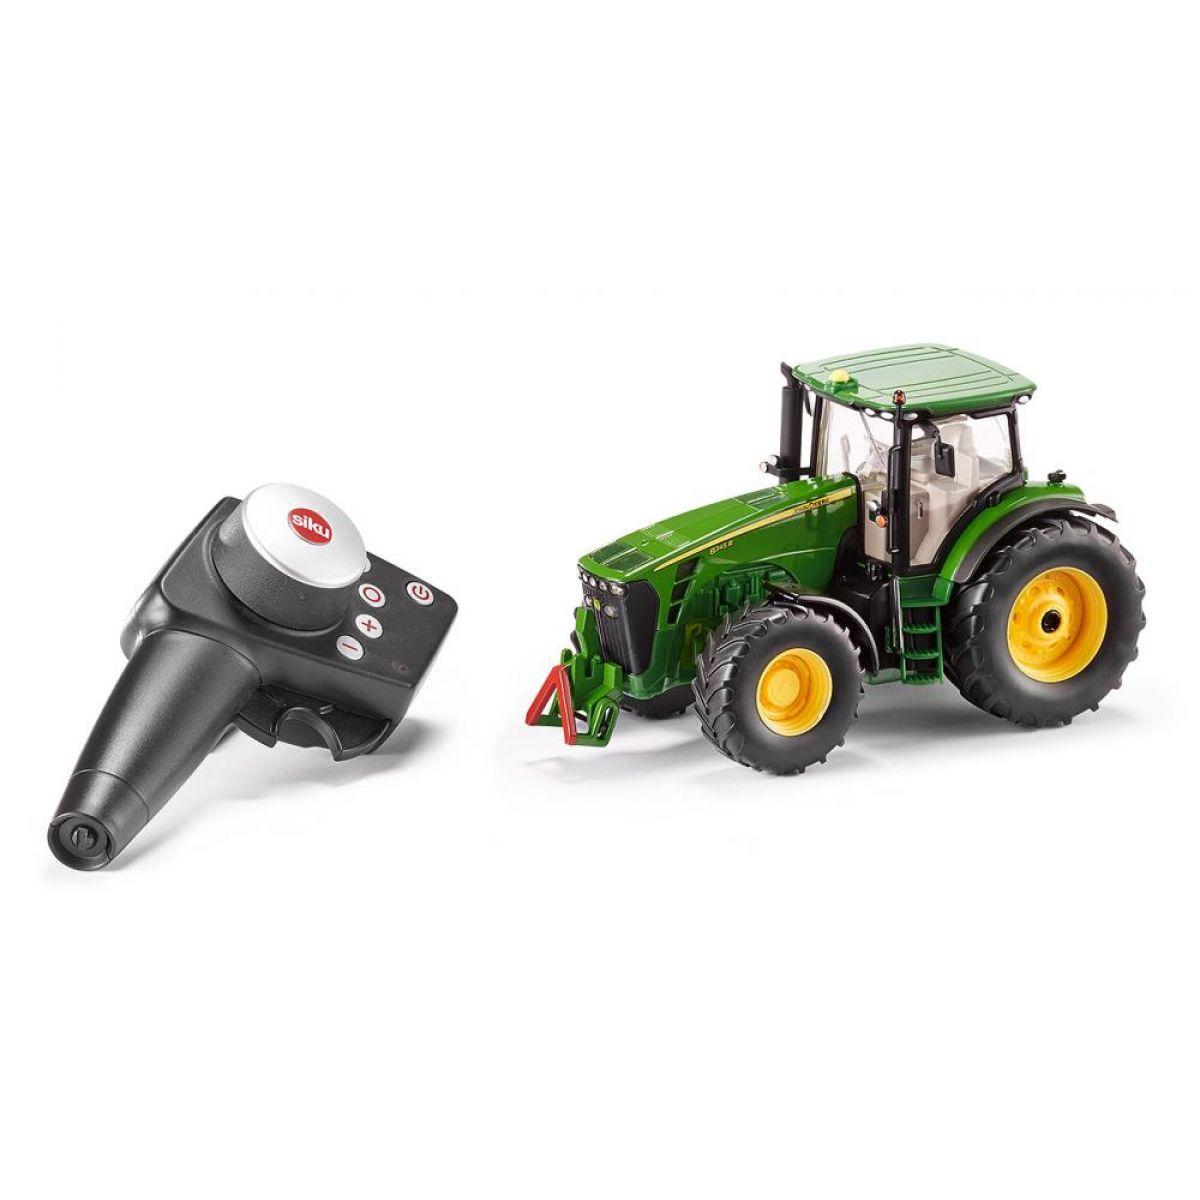 Siku Control RC traktor John Deere 8345R s dálkovým ovládáním 1:32